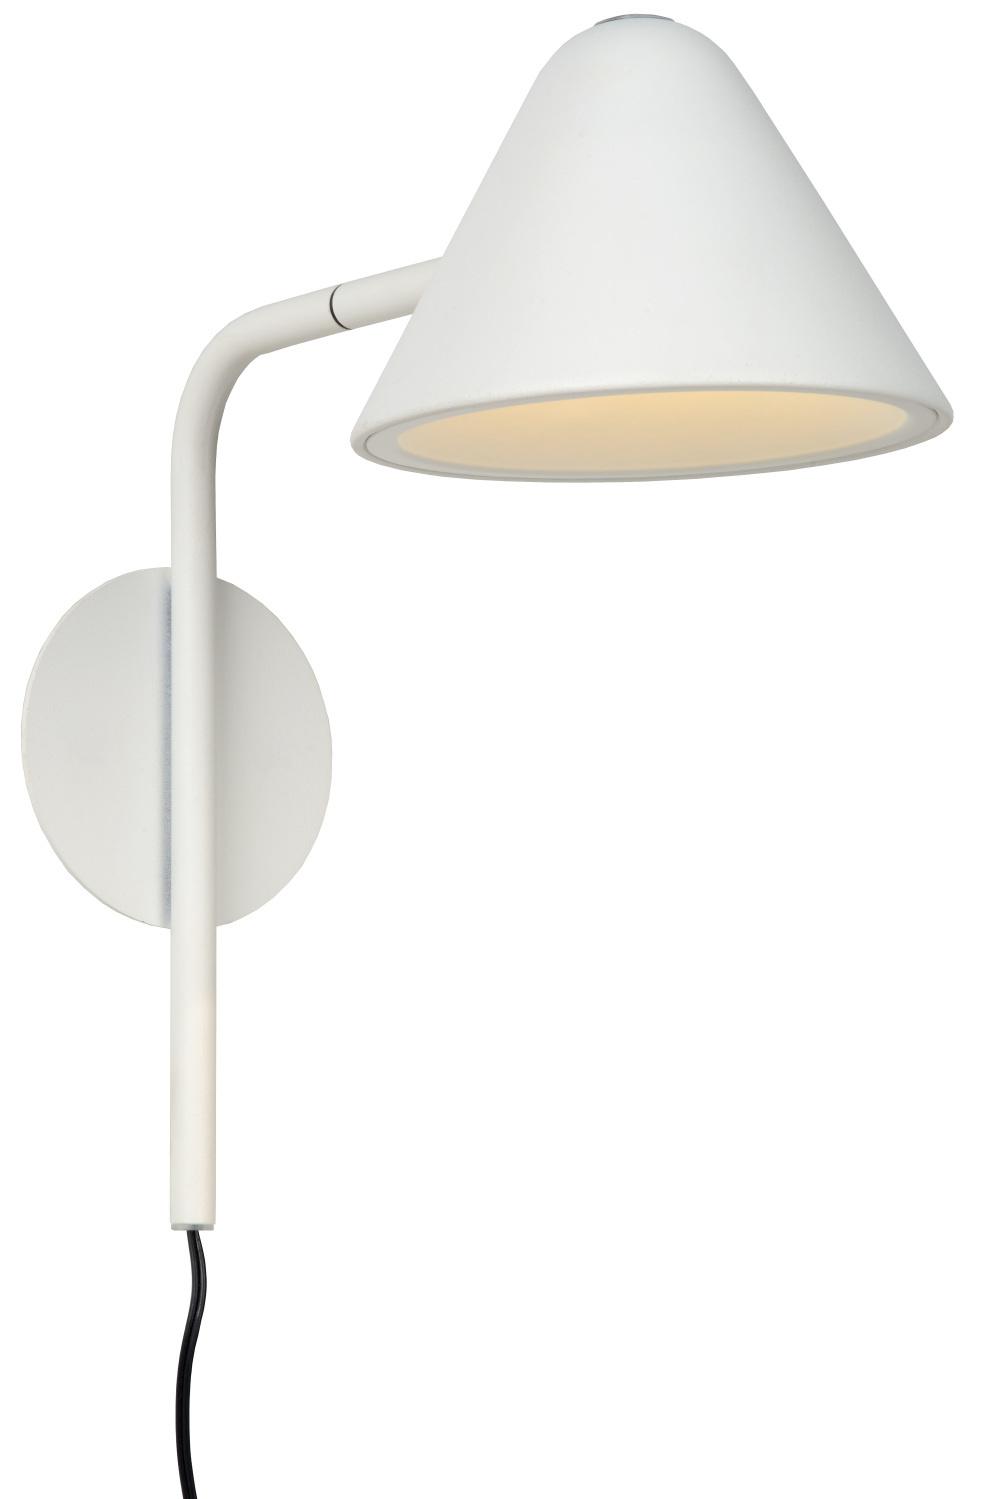 Lucide DEVON Wandlamp LED 3W 3000K Wit